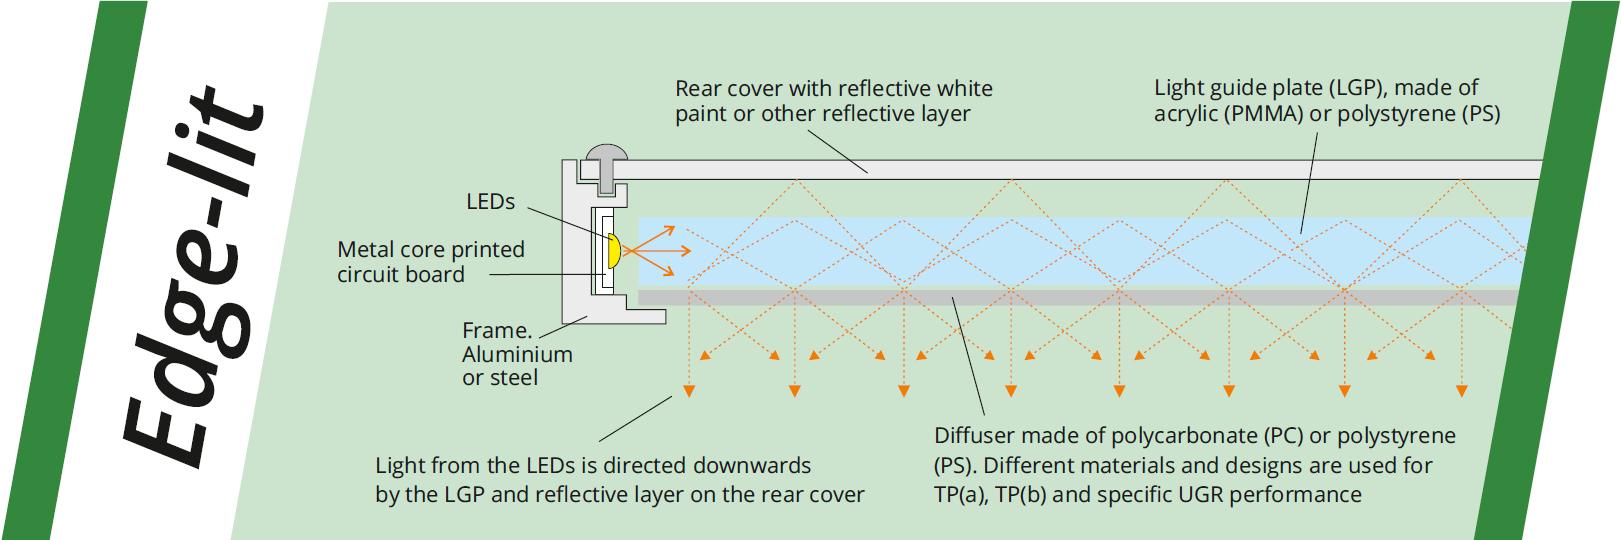 edge-lit led panel light